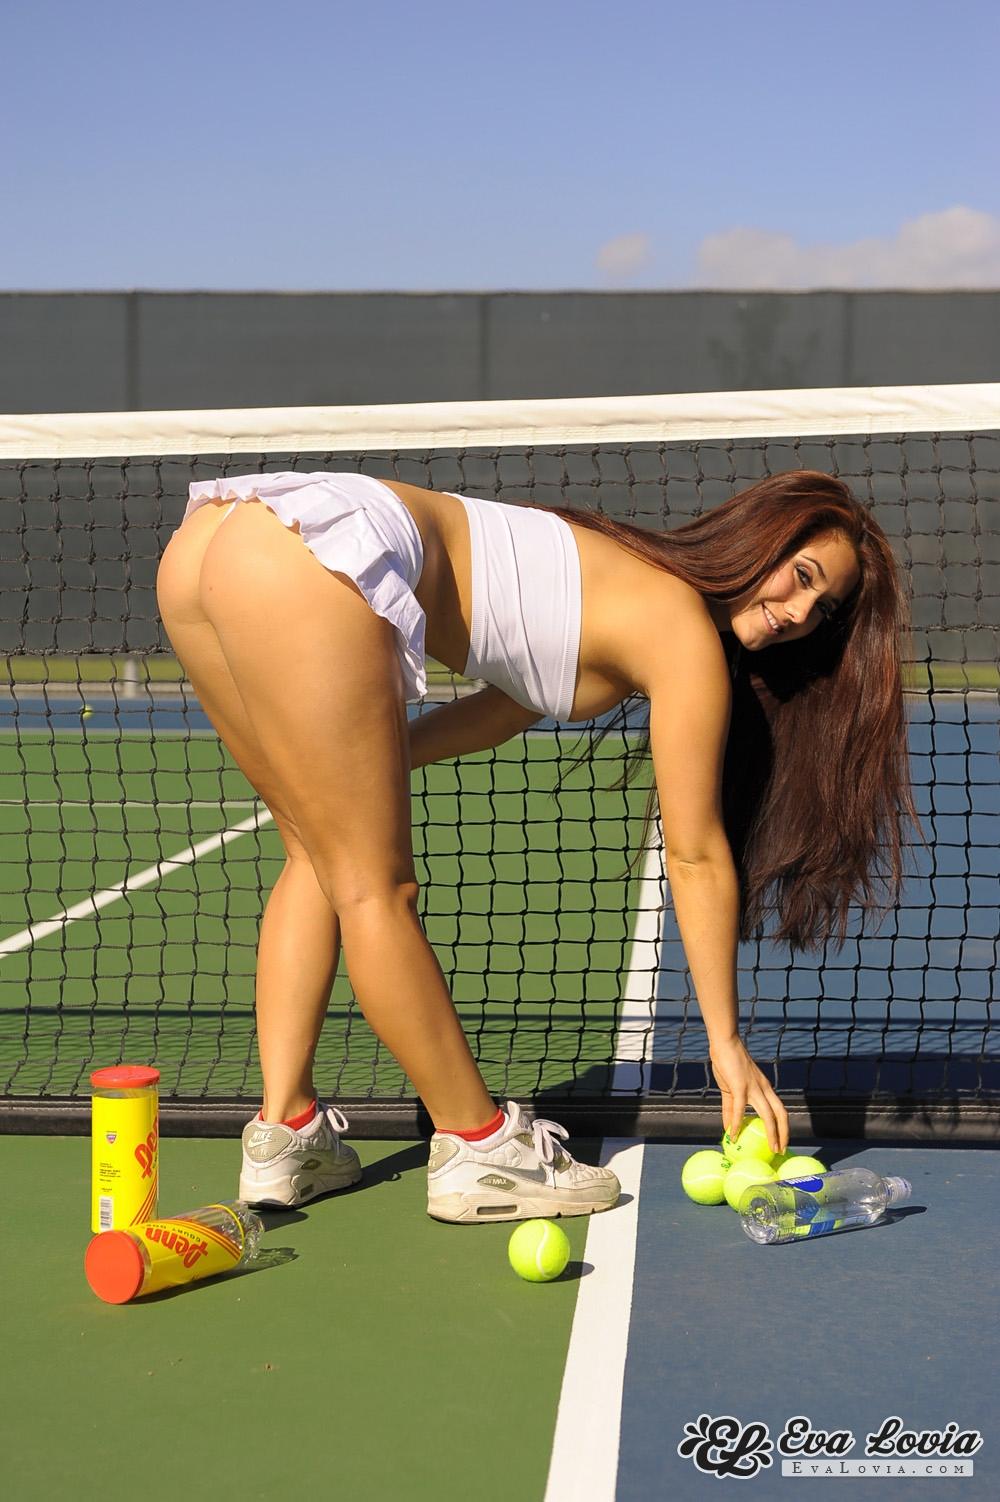 Free hotties latino model nude pic